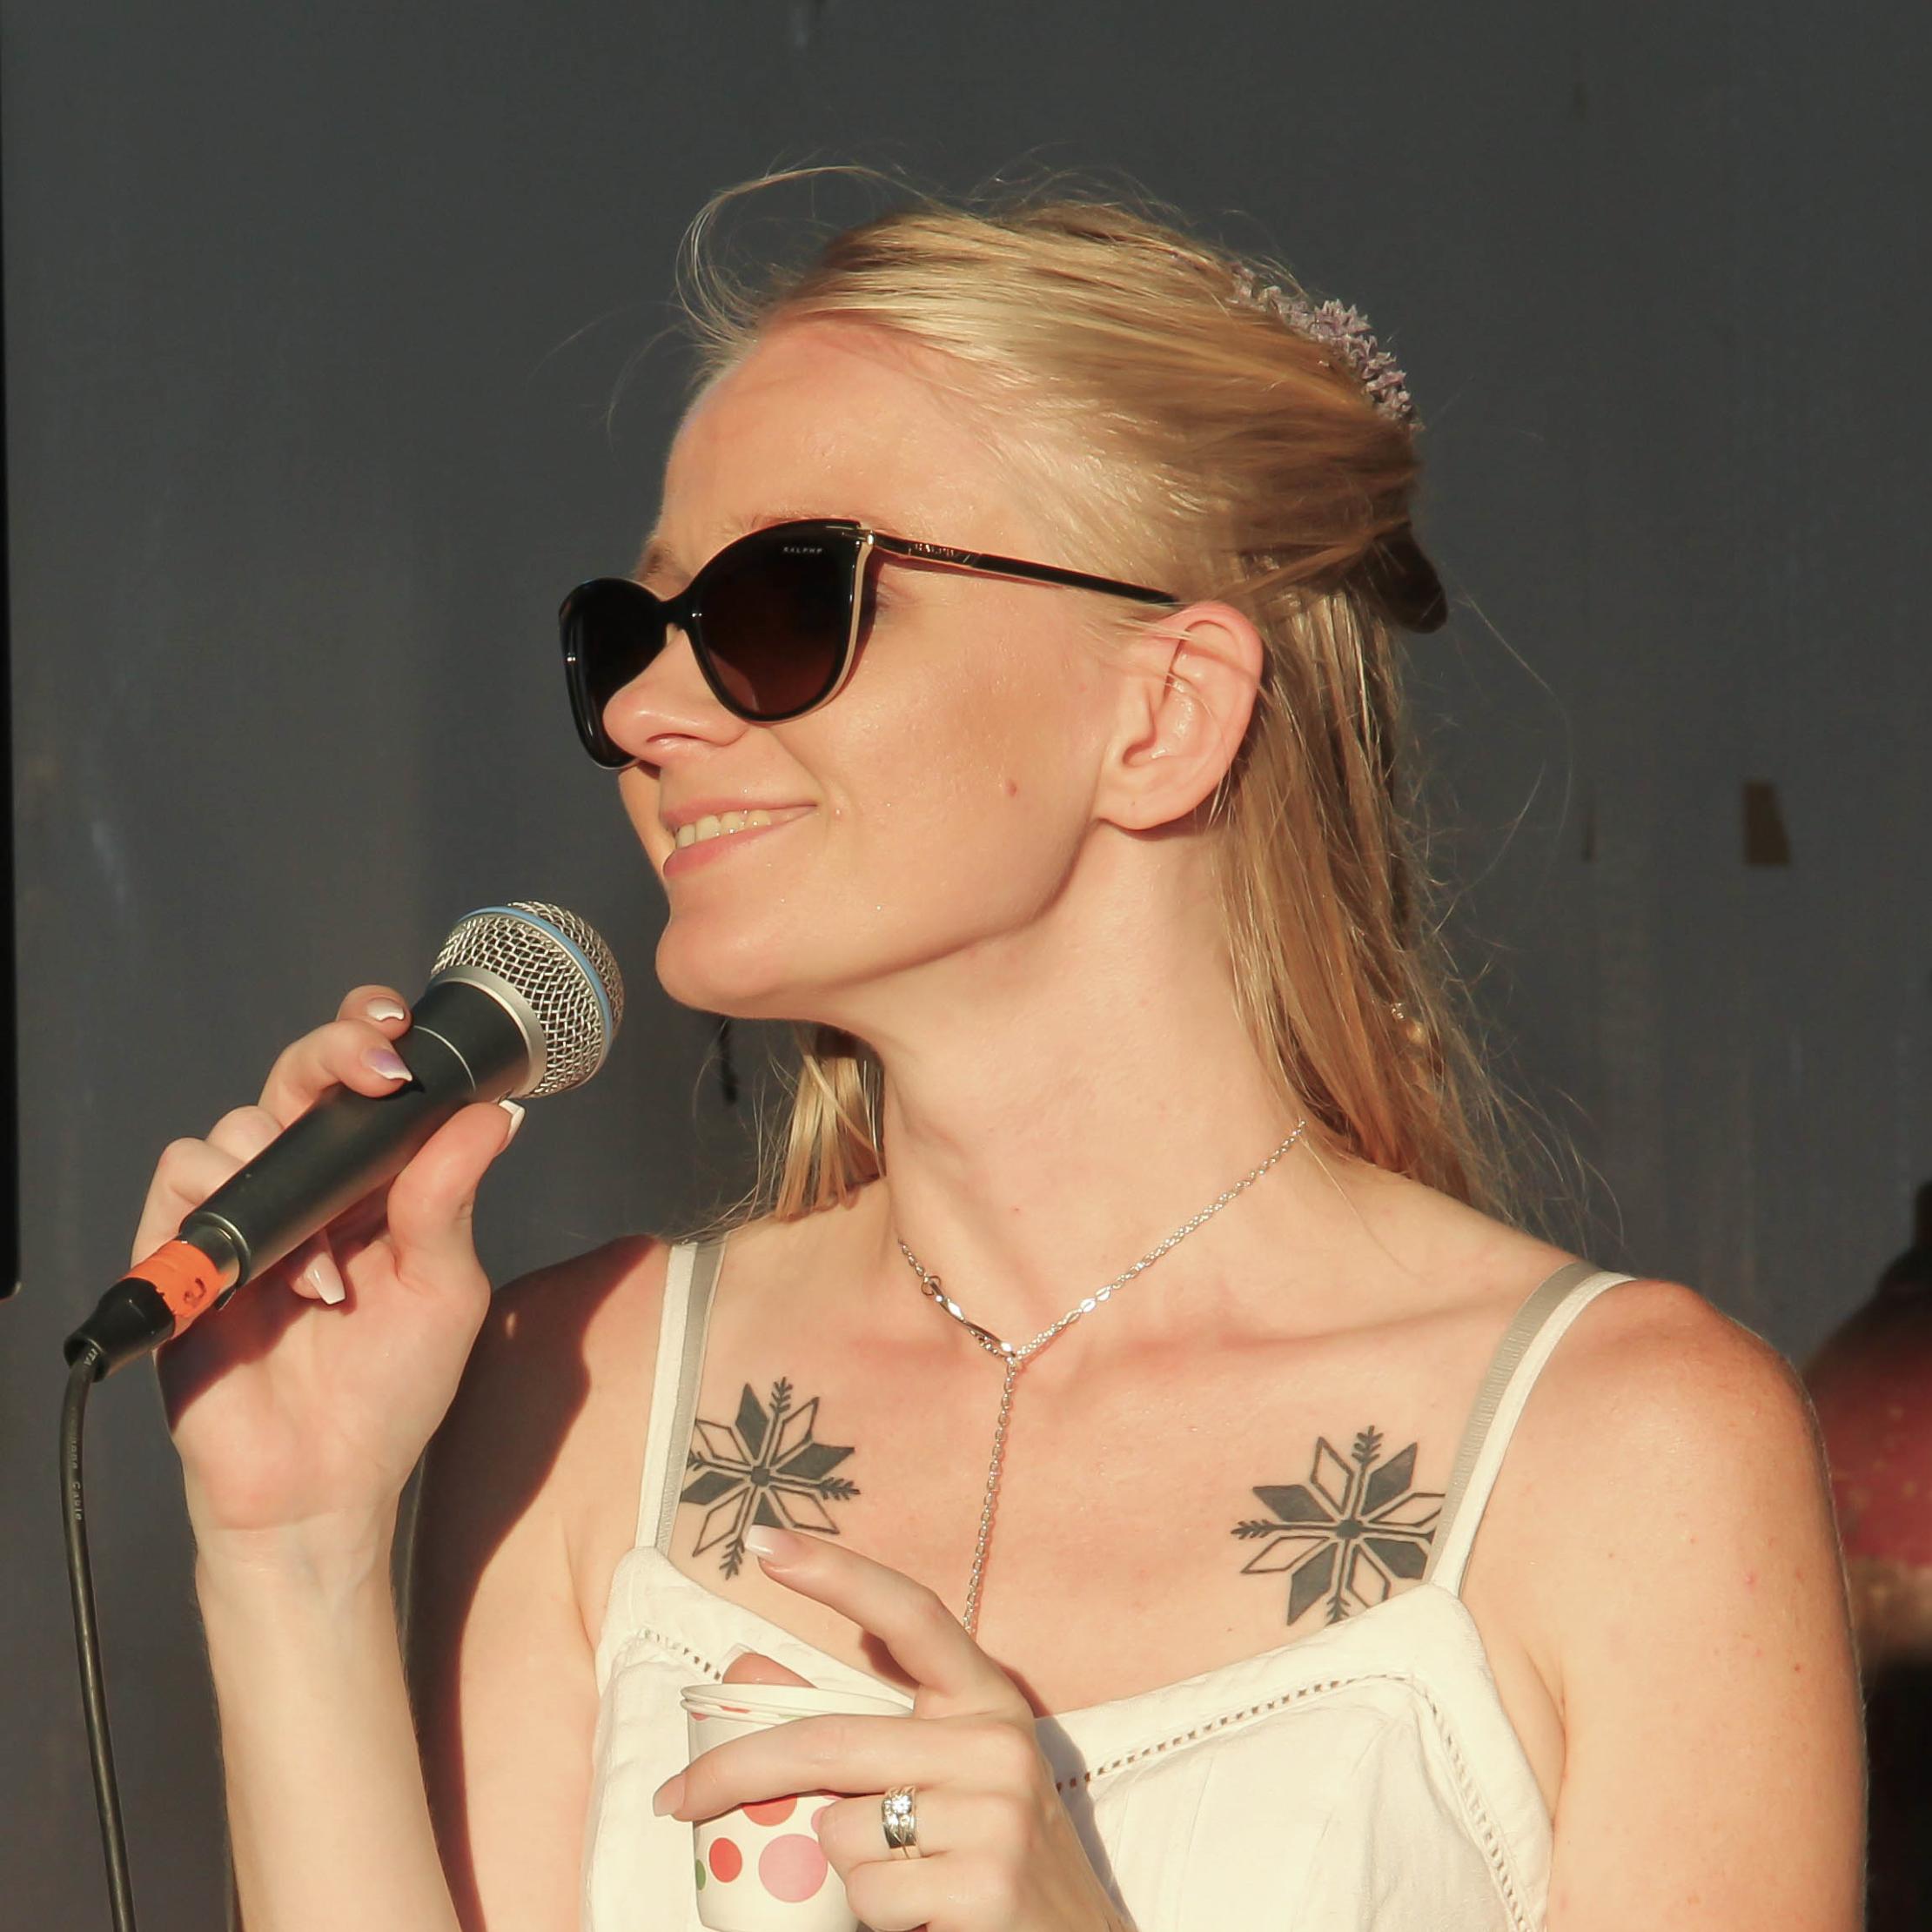 Christina Young